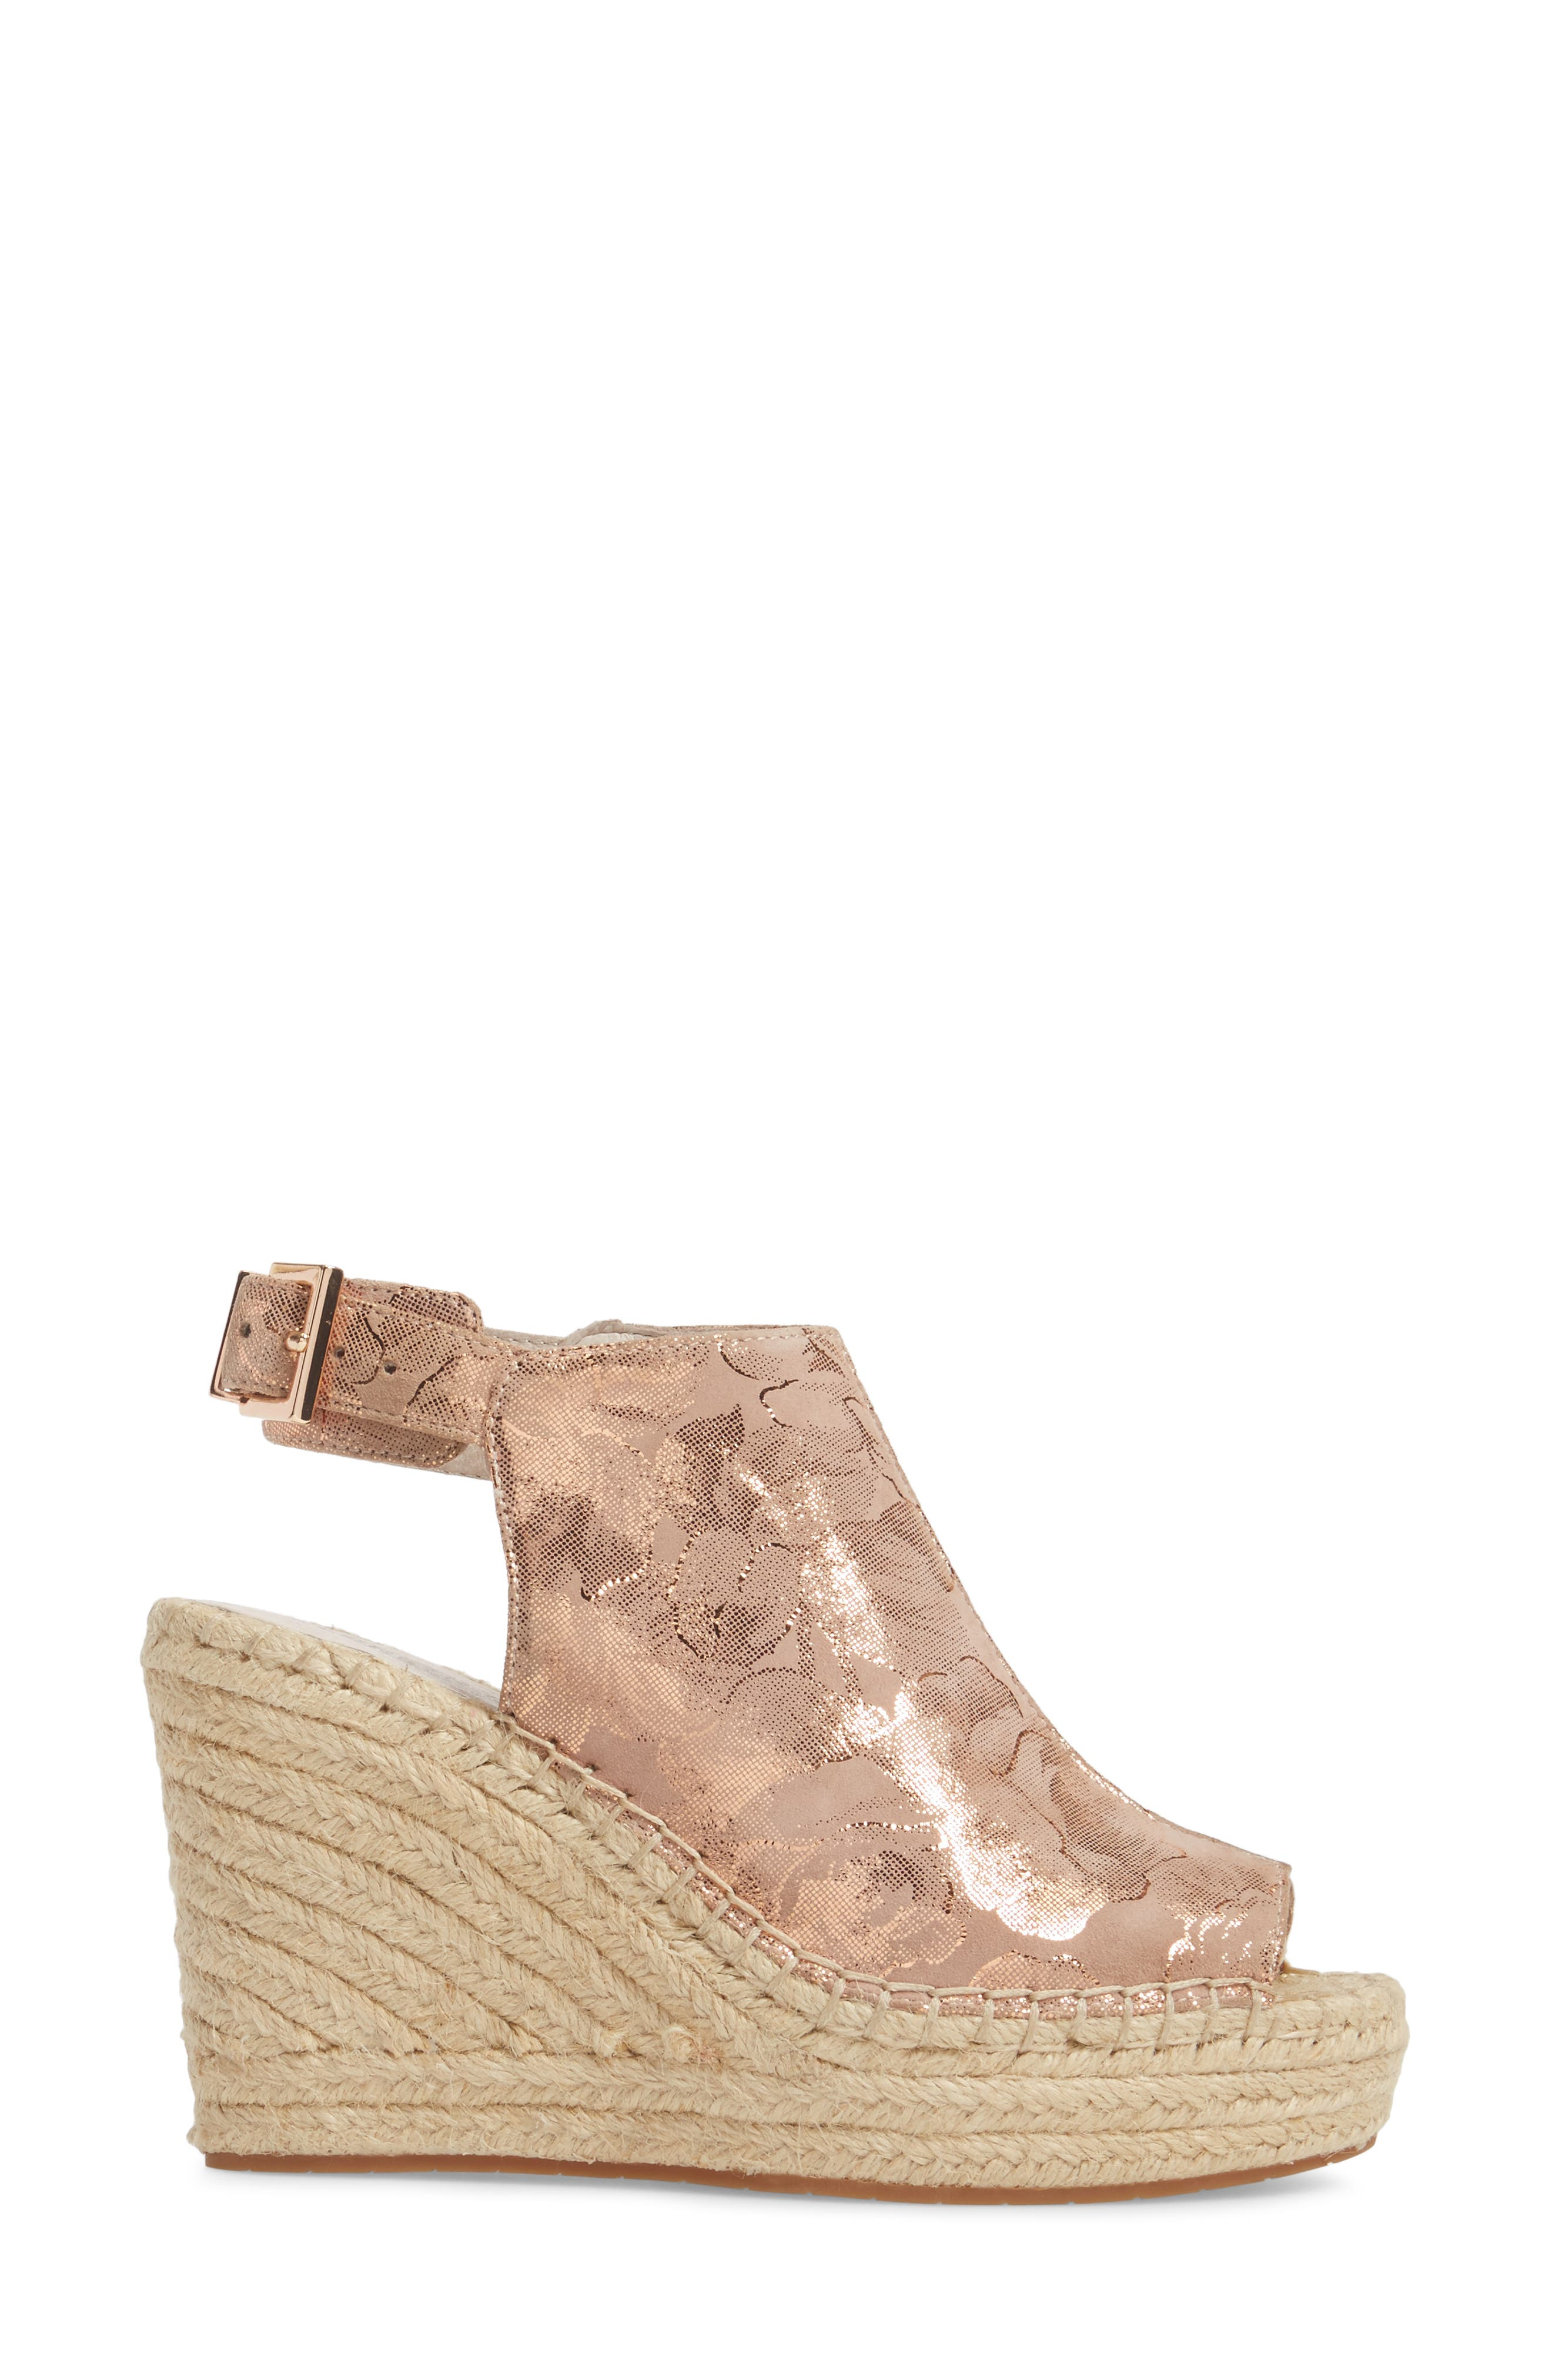 'Olivia' Wedge Sandal,                             Alternate thumbnail 3, color,                             Rose Gold Leather